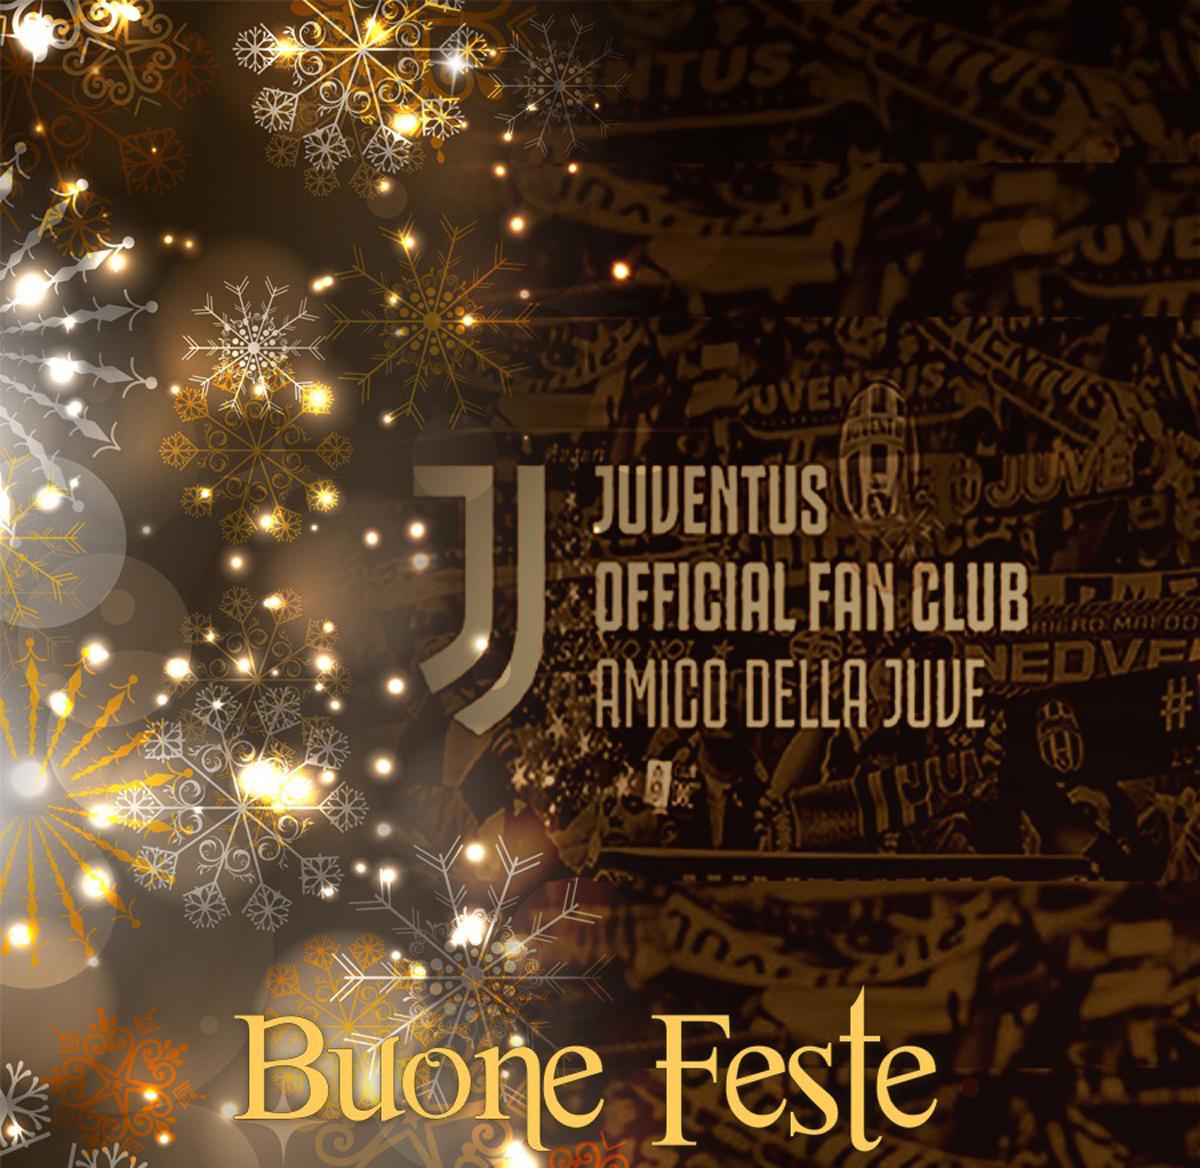 Juventus Buon Natale.Buone Feste Juventus Official Fan Club Amico Della Juve